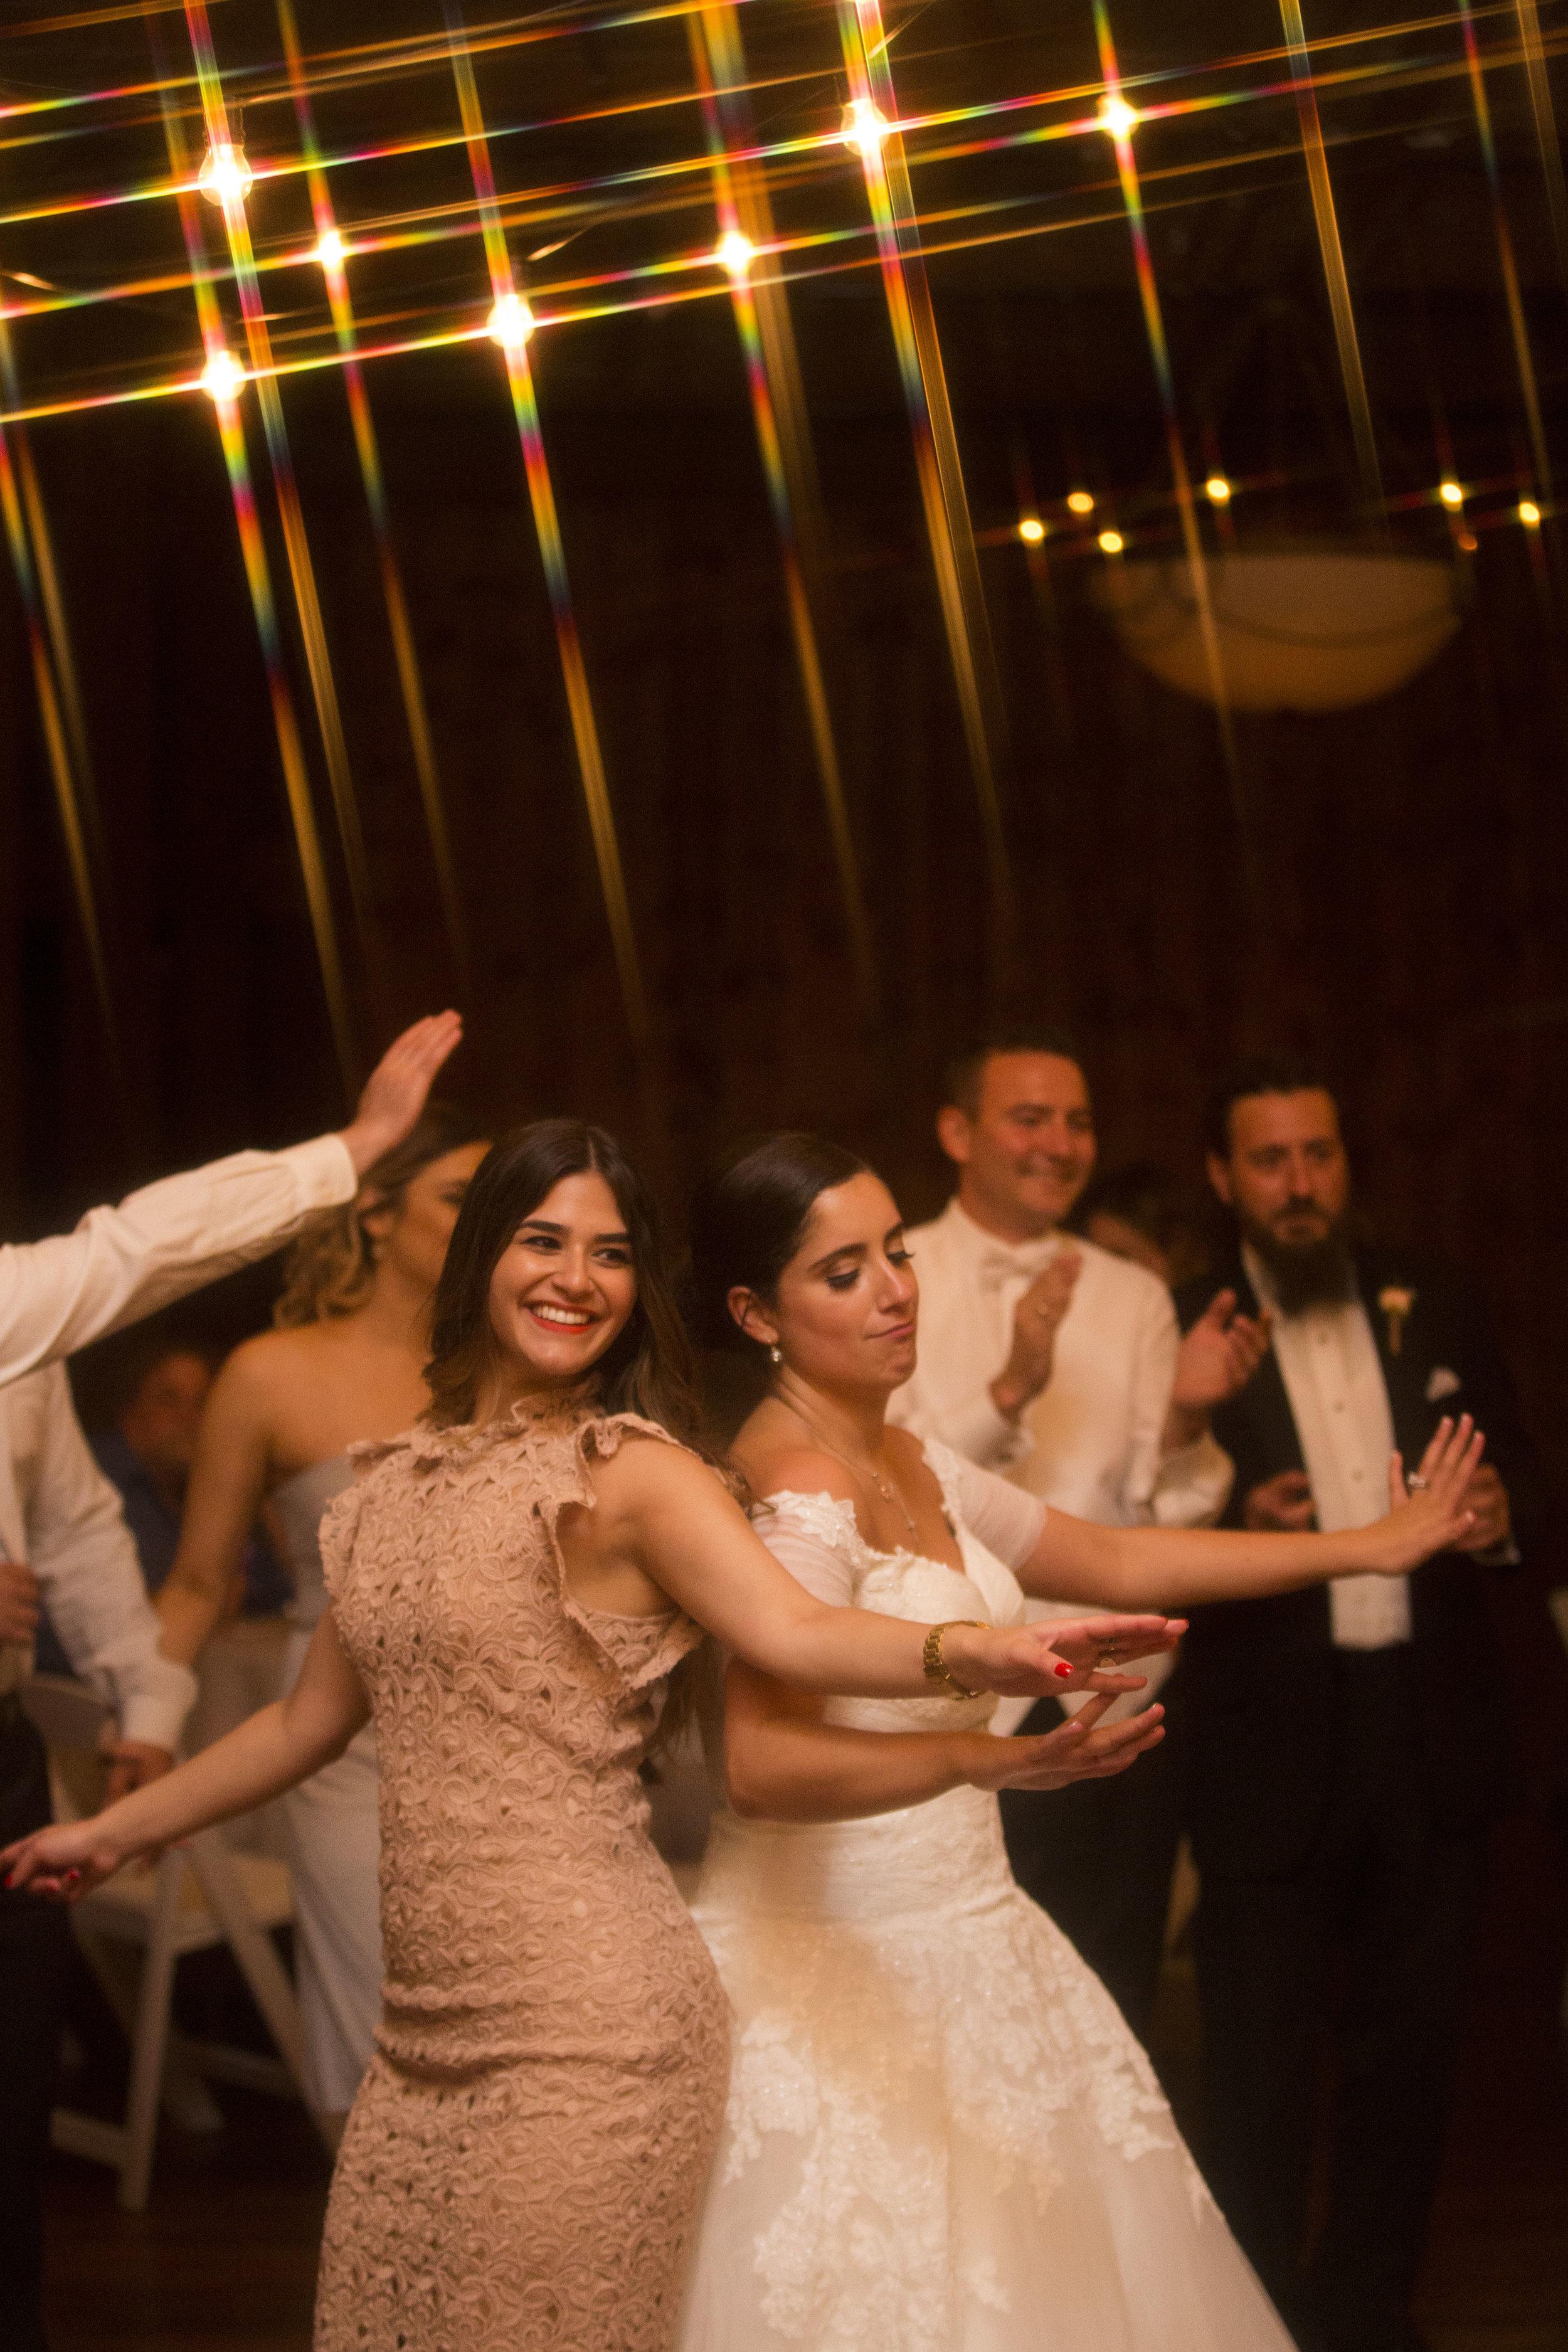 ATGI_Magali & Josh Wedding1_2S8A2114.jpg